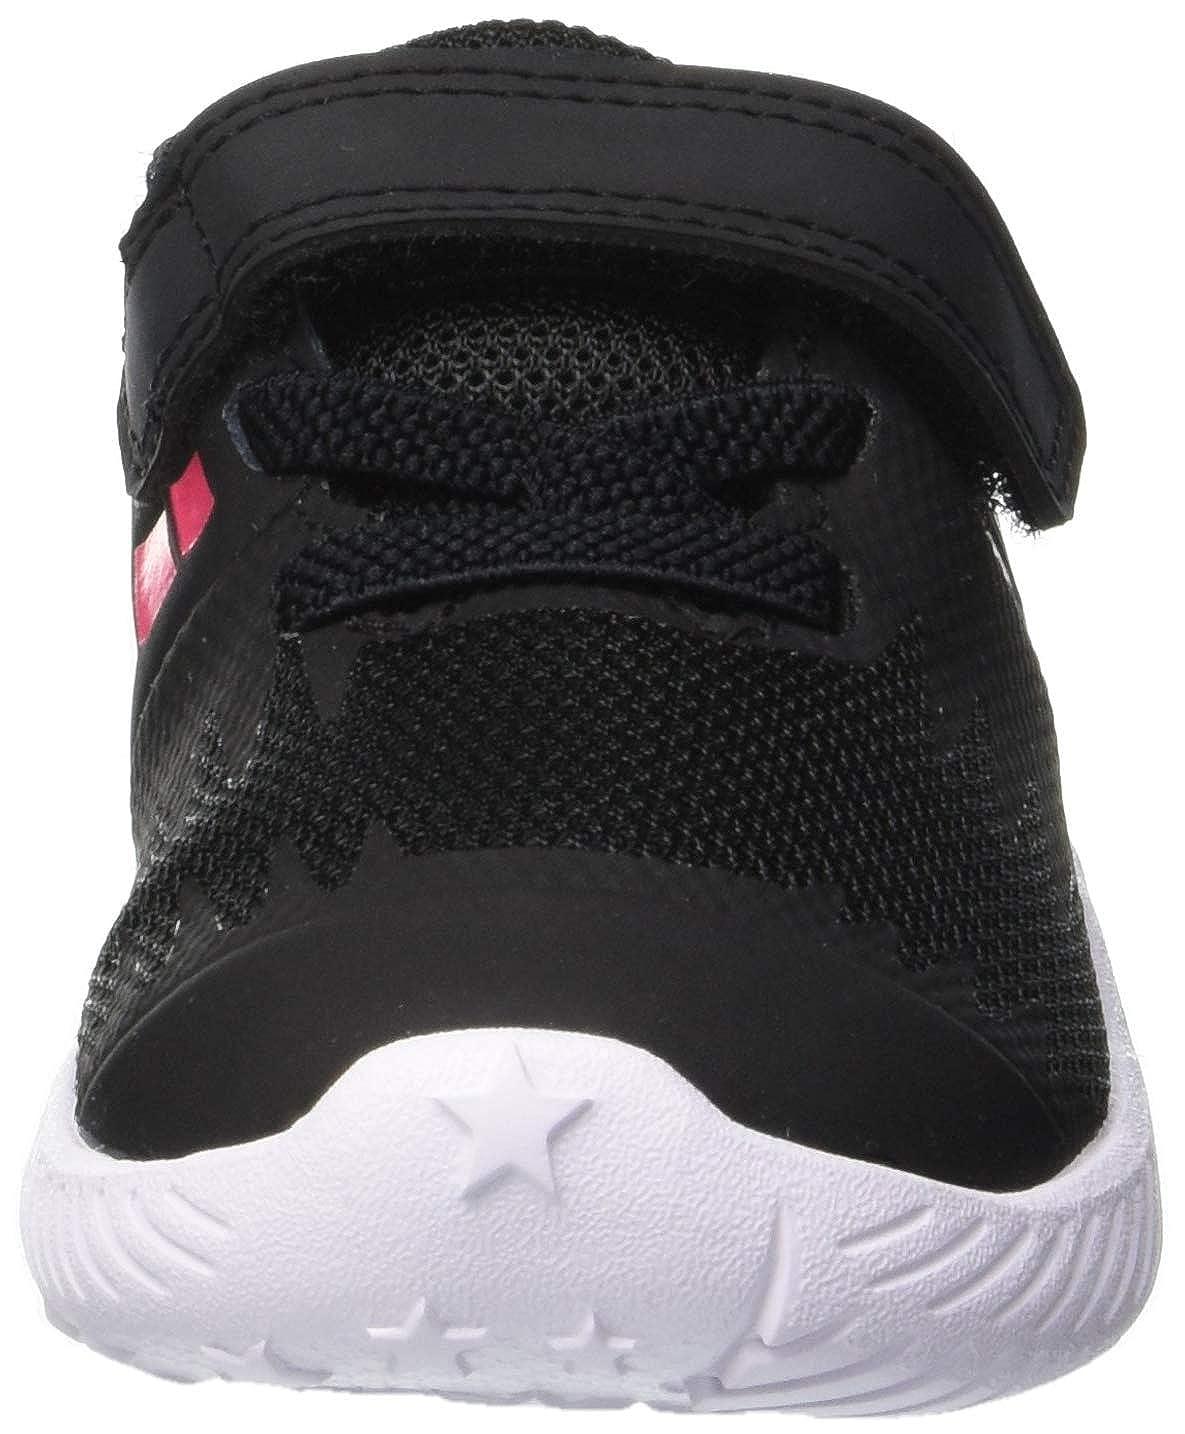 Nike Star Runner TDV Chaussures de Running gar/çon